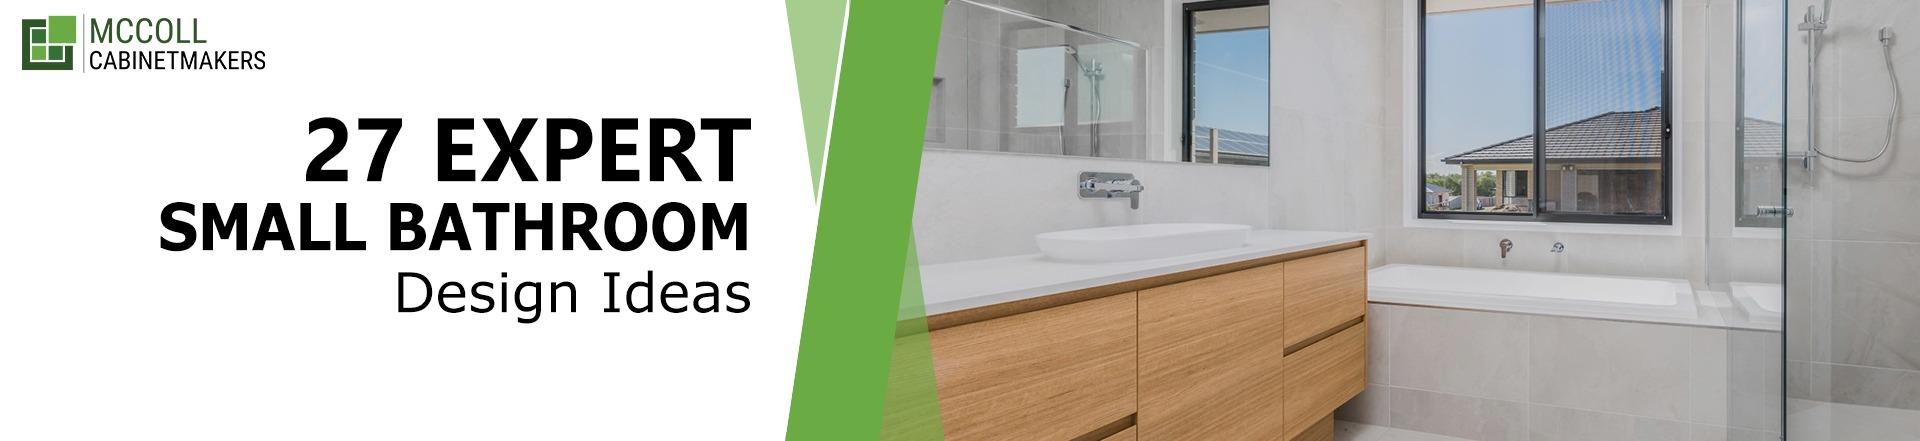 27 Expert Small Bathroom Design Ideas